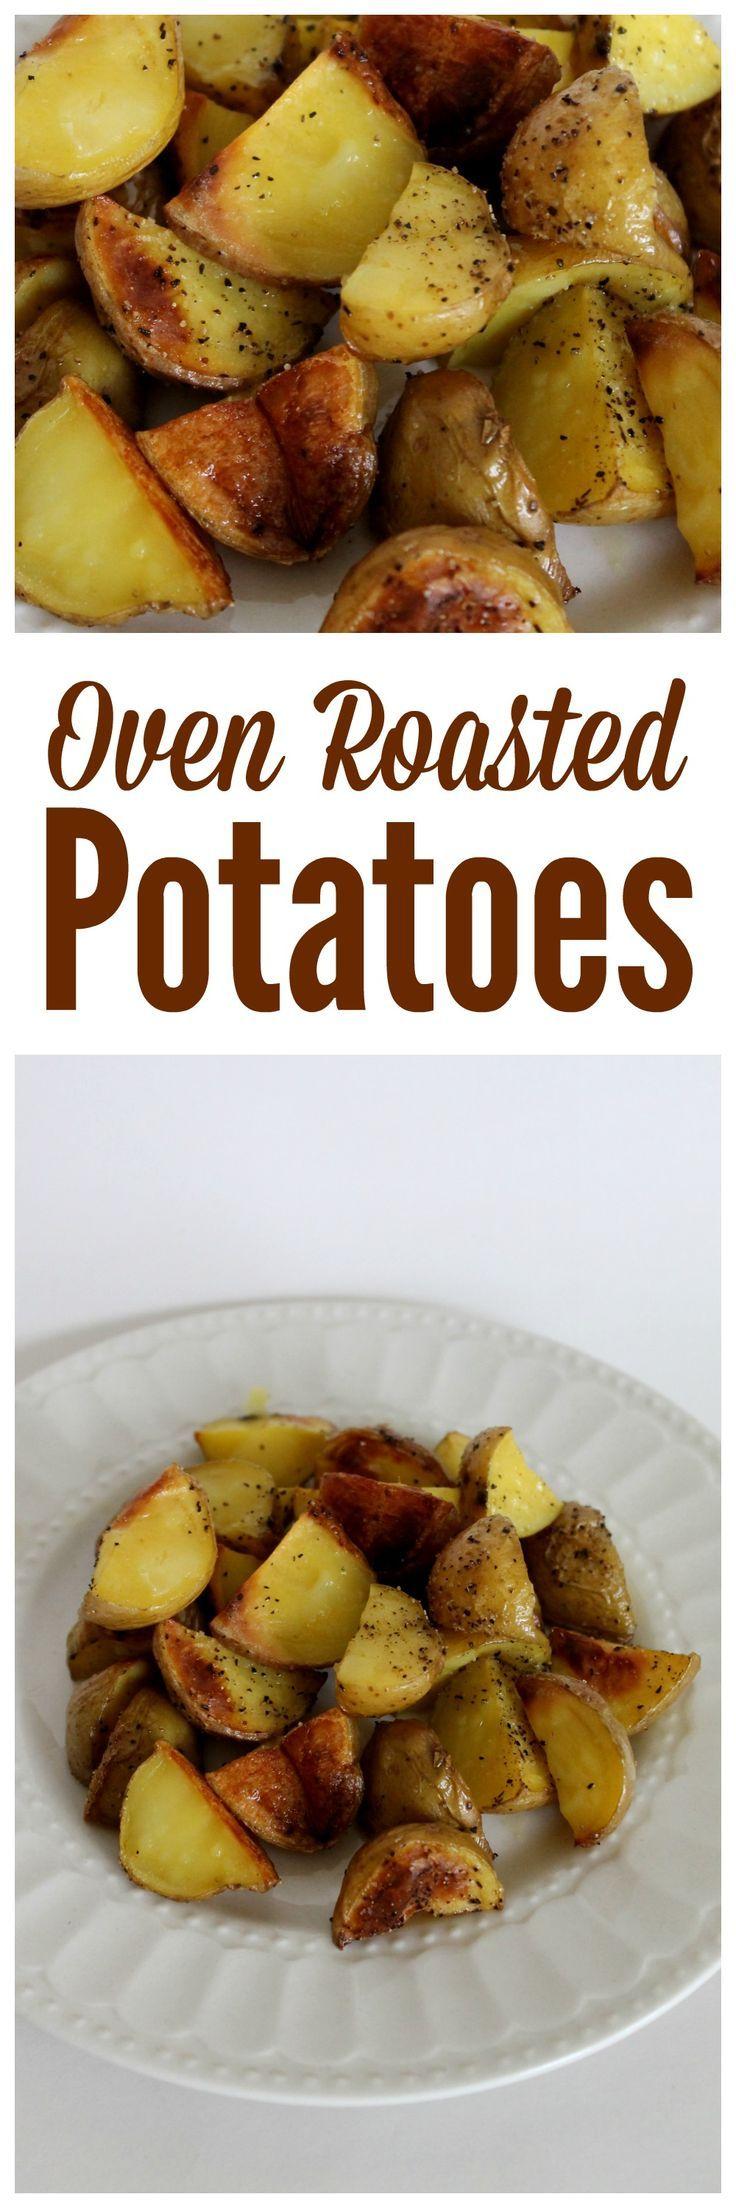 Oven Roasted Potatoes | Roasted Potato Recipes | Crispy Oven Roasted Potatoes